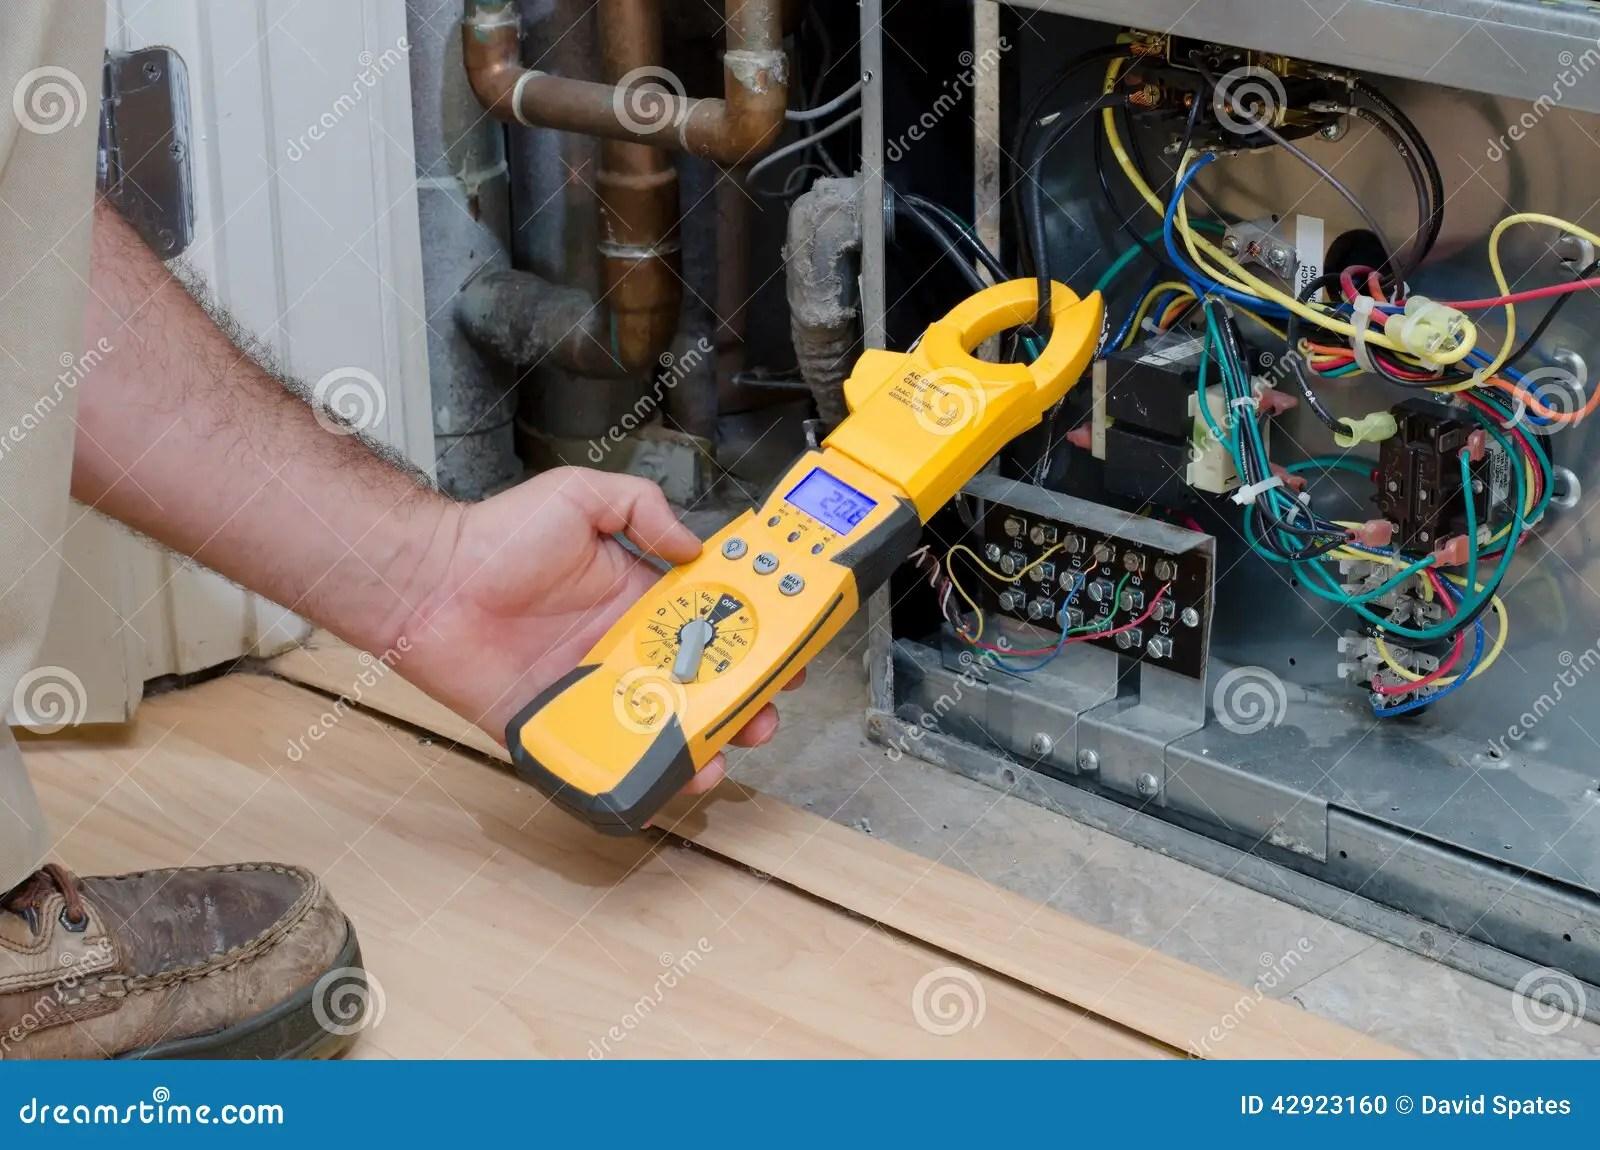 Ac Compressor Wiring Diagram Technician Checking Compressor Amps Stock Photo Image Of